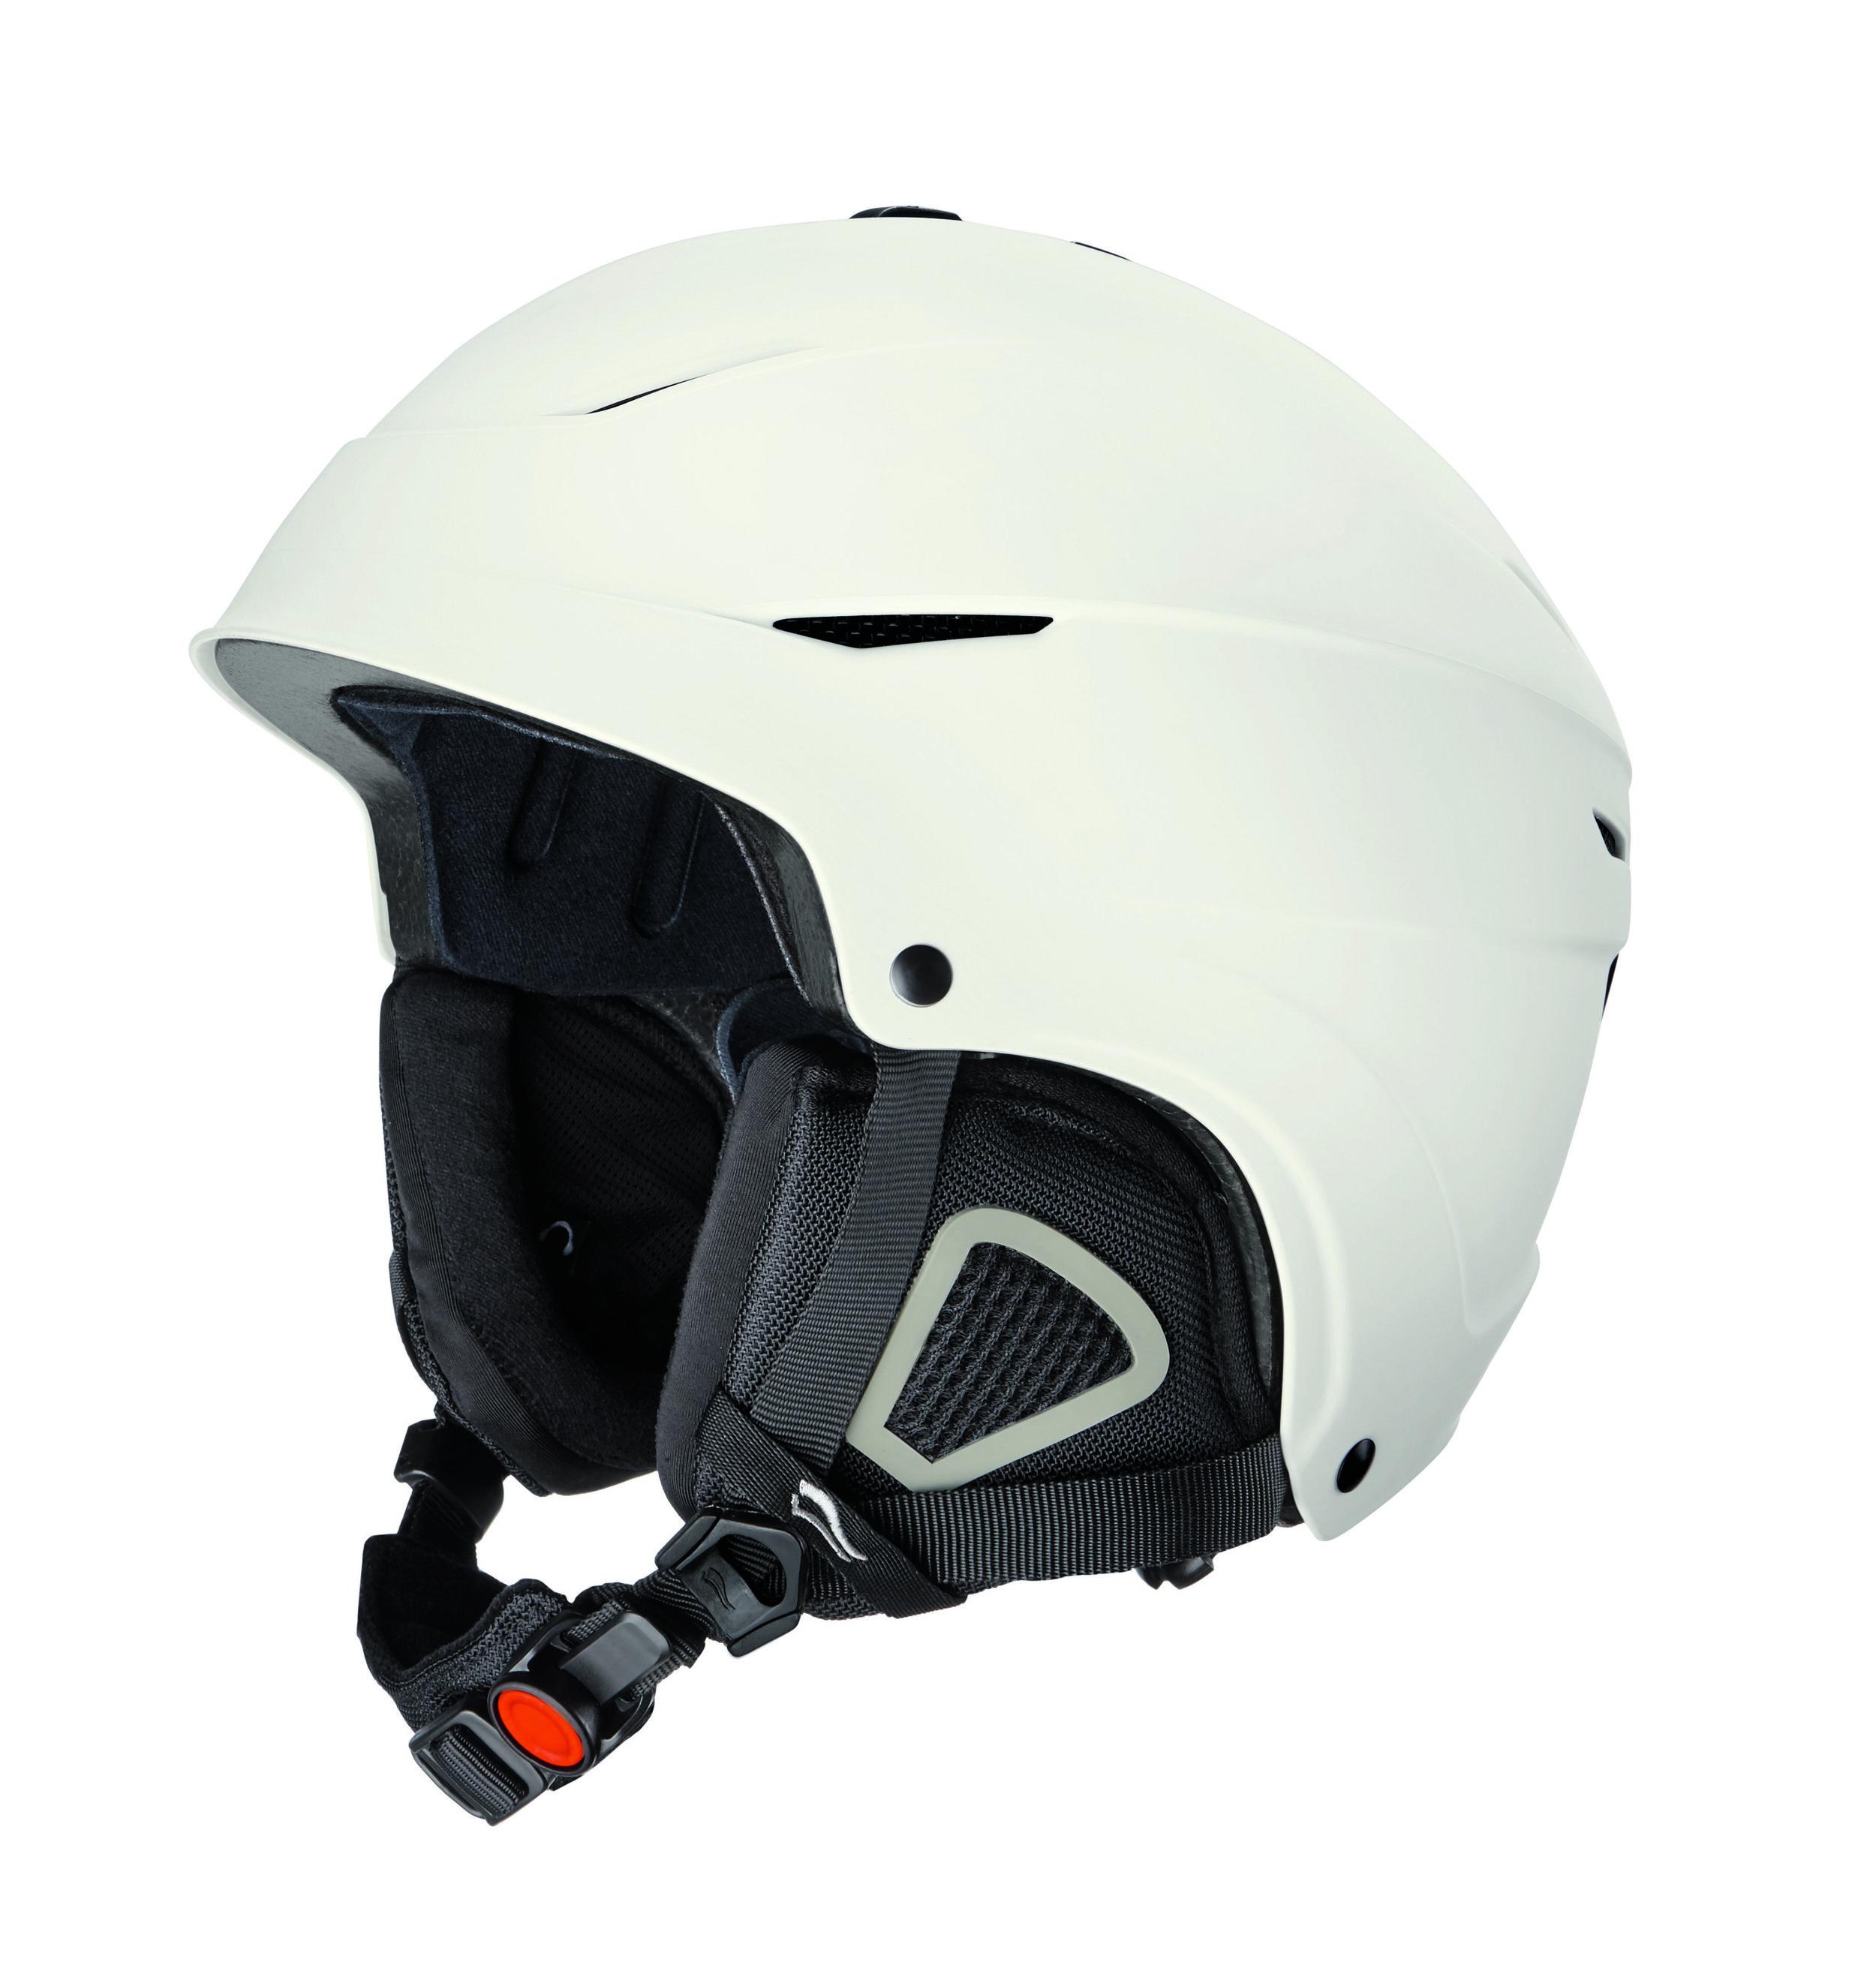 Ski & Snowboard Helmet £19.99 (1).JPG